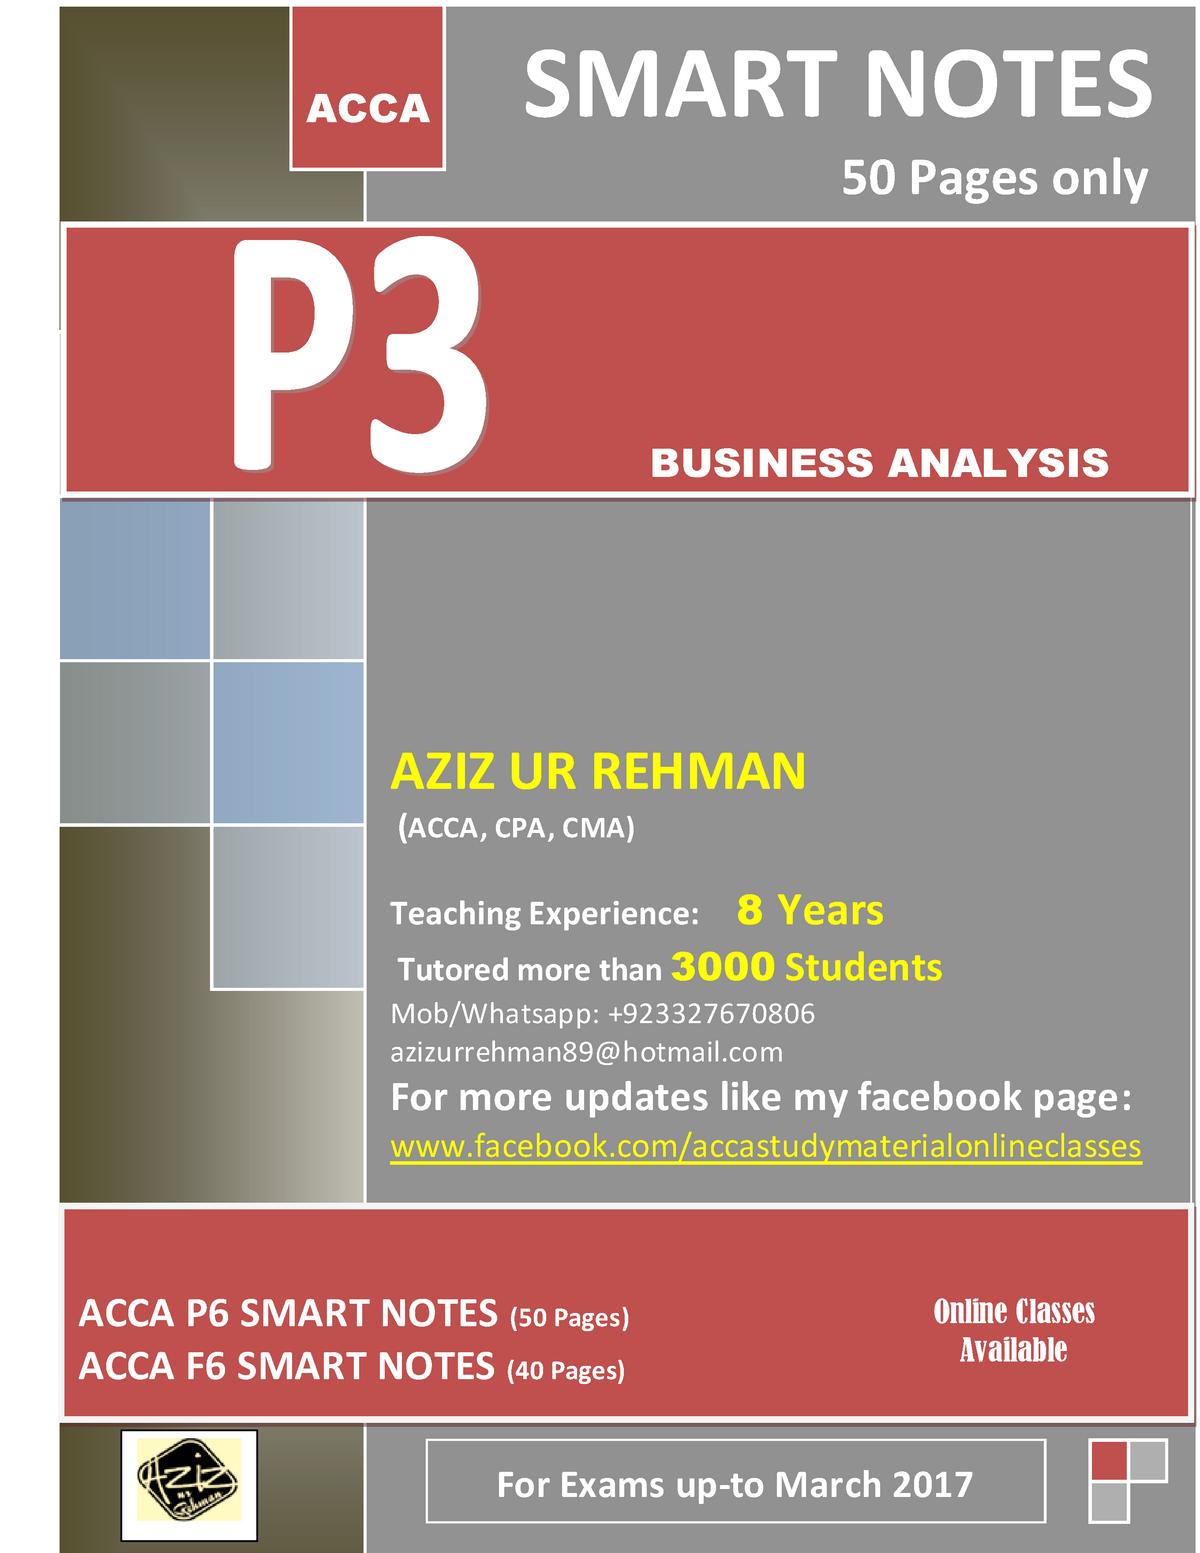 ACCA SBL Smart NOTES - Bachelor in Business BLO1105 - StuDocu